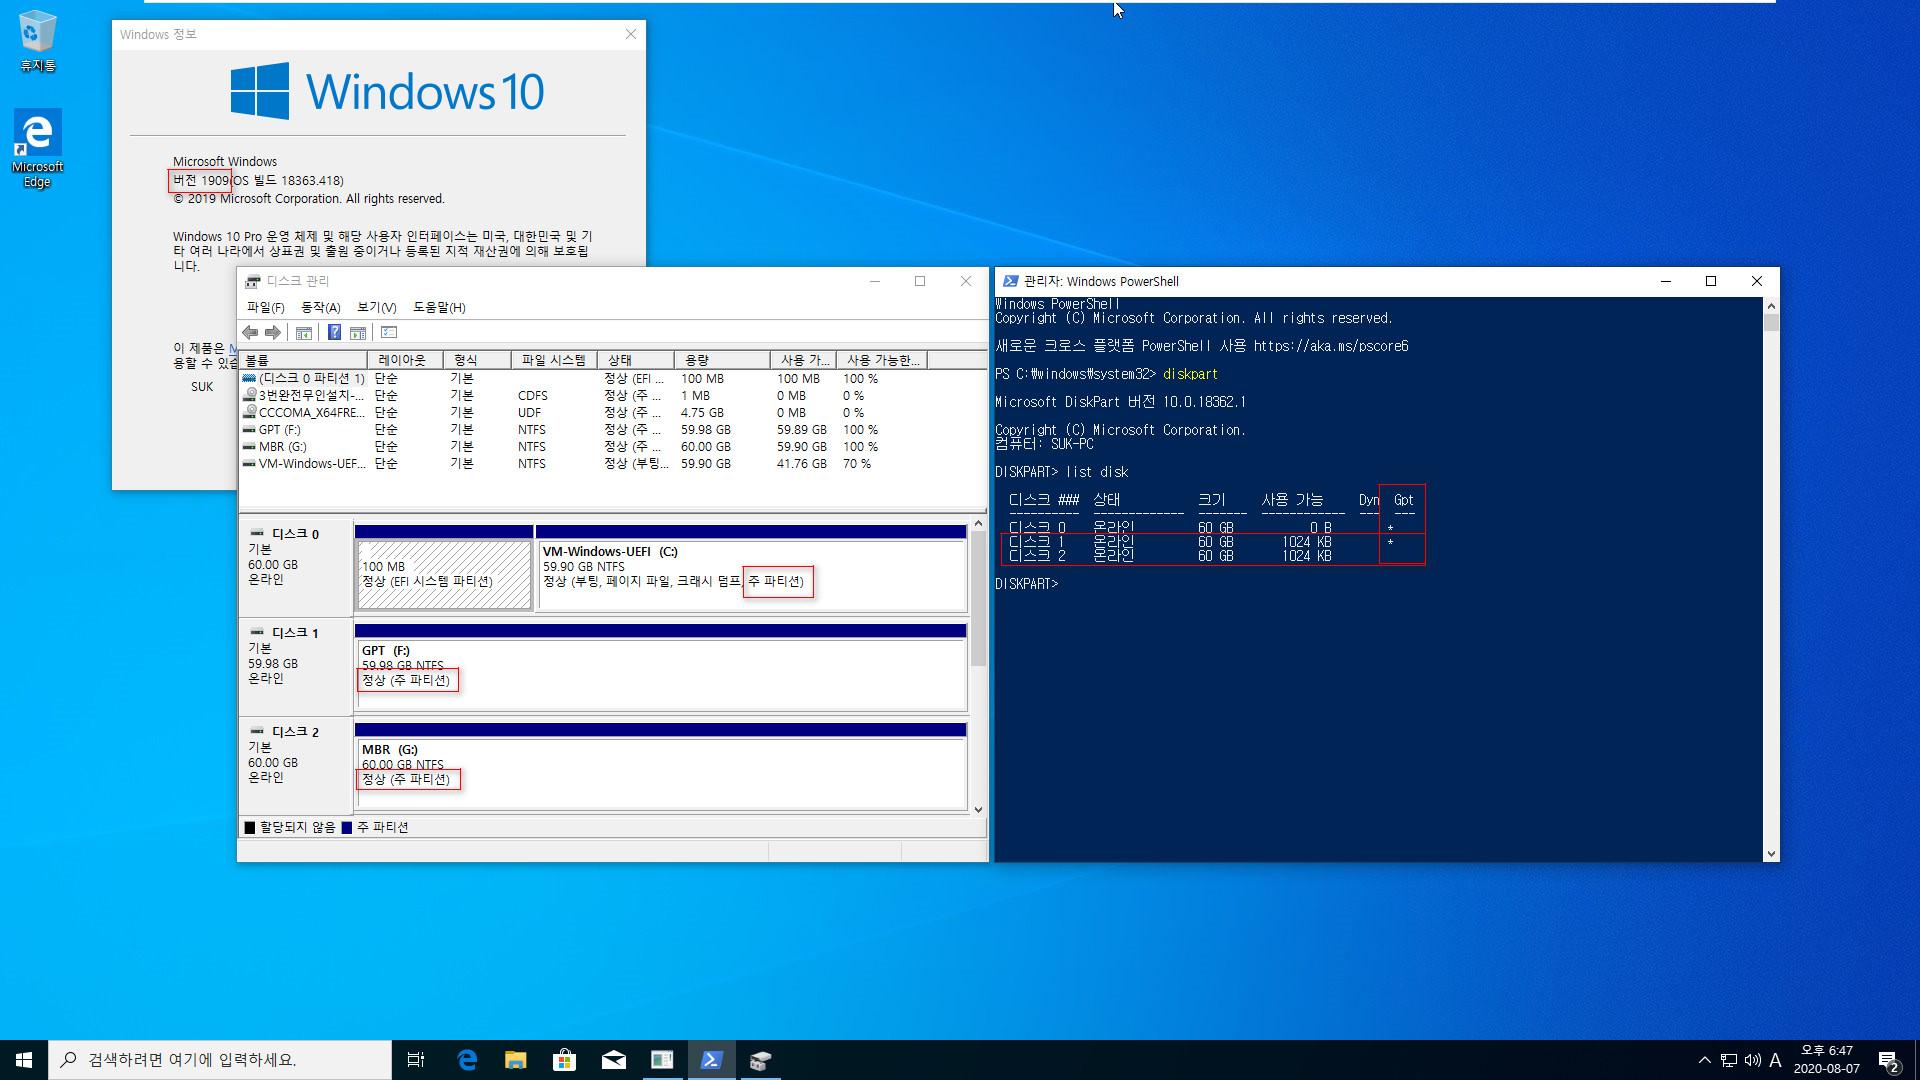 GPT 디스크의 파티션 표시만 버전 2004부터 기본 데이터 파티션으로 달라졌네요. 윈도우 파티션도 기본 데이터 파티션으로 표기됩니다 - Windows 10 버전 1909까지는 이전 방식으로 주 파티션으로 표기됩니다 2020-08-07_184749.jpg